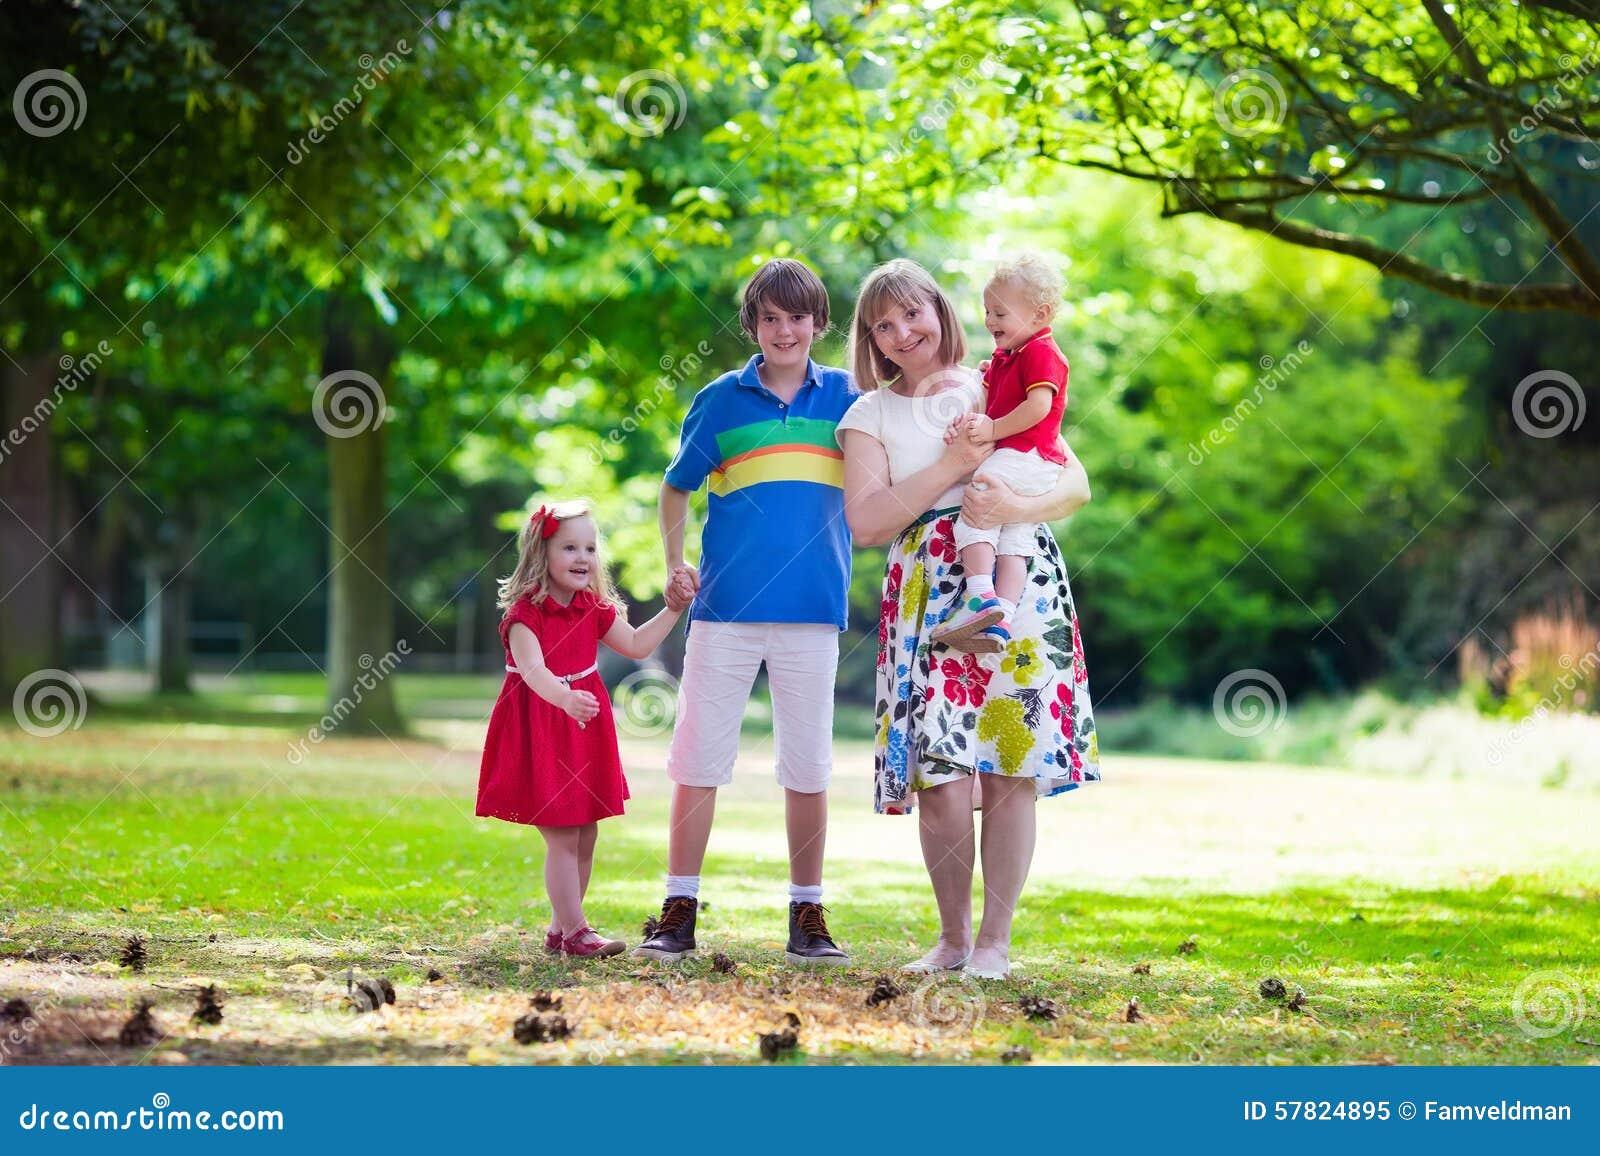 8644ec26703 Download Γιαγιά και παιδιά που περπατούν σε ένα πάρκο Στοκ Εικόνα - εικόνα  από grandparent,